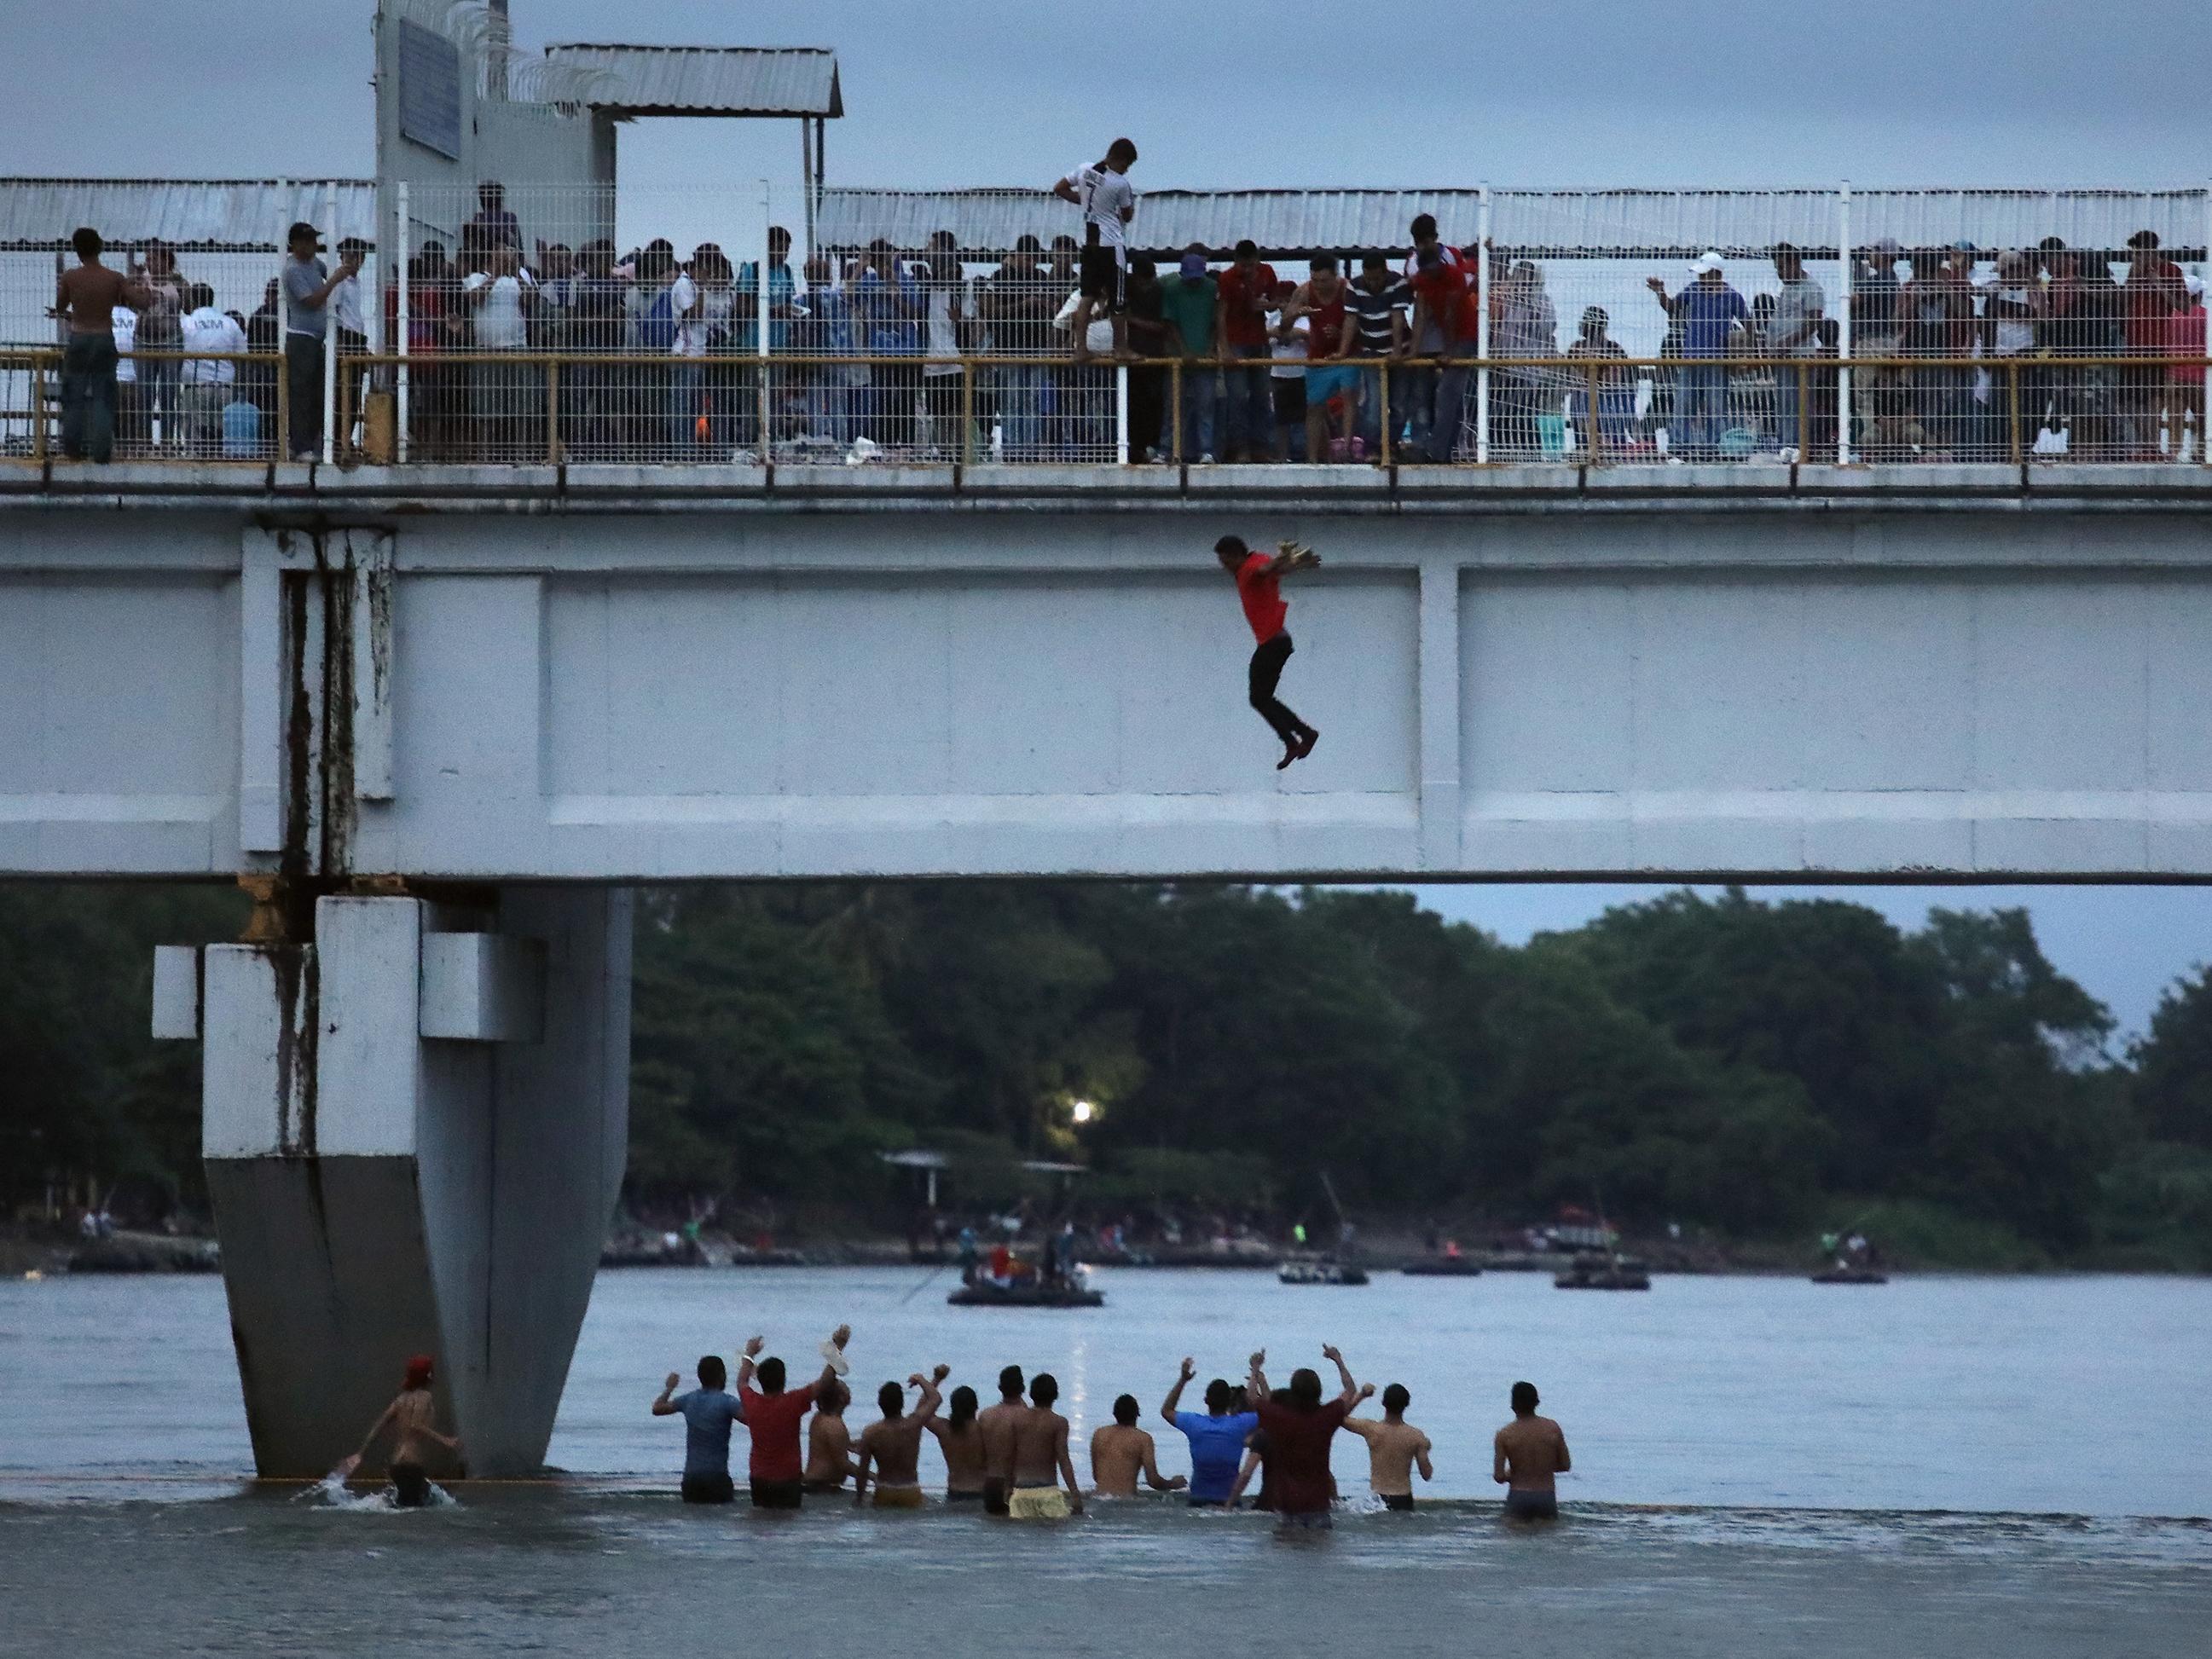 An migrant jumps off a bridge to enter Ciudad Hidalgo, Mexico, from Guatemala on Saturday.